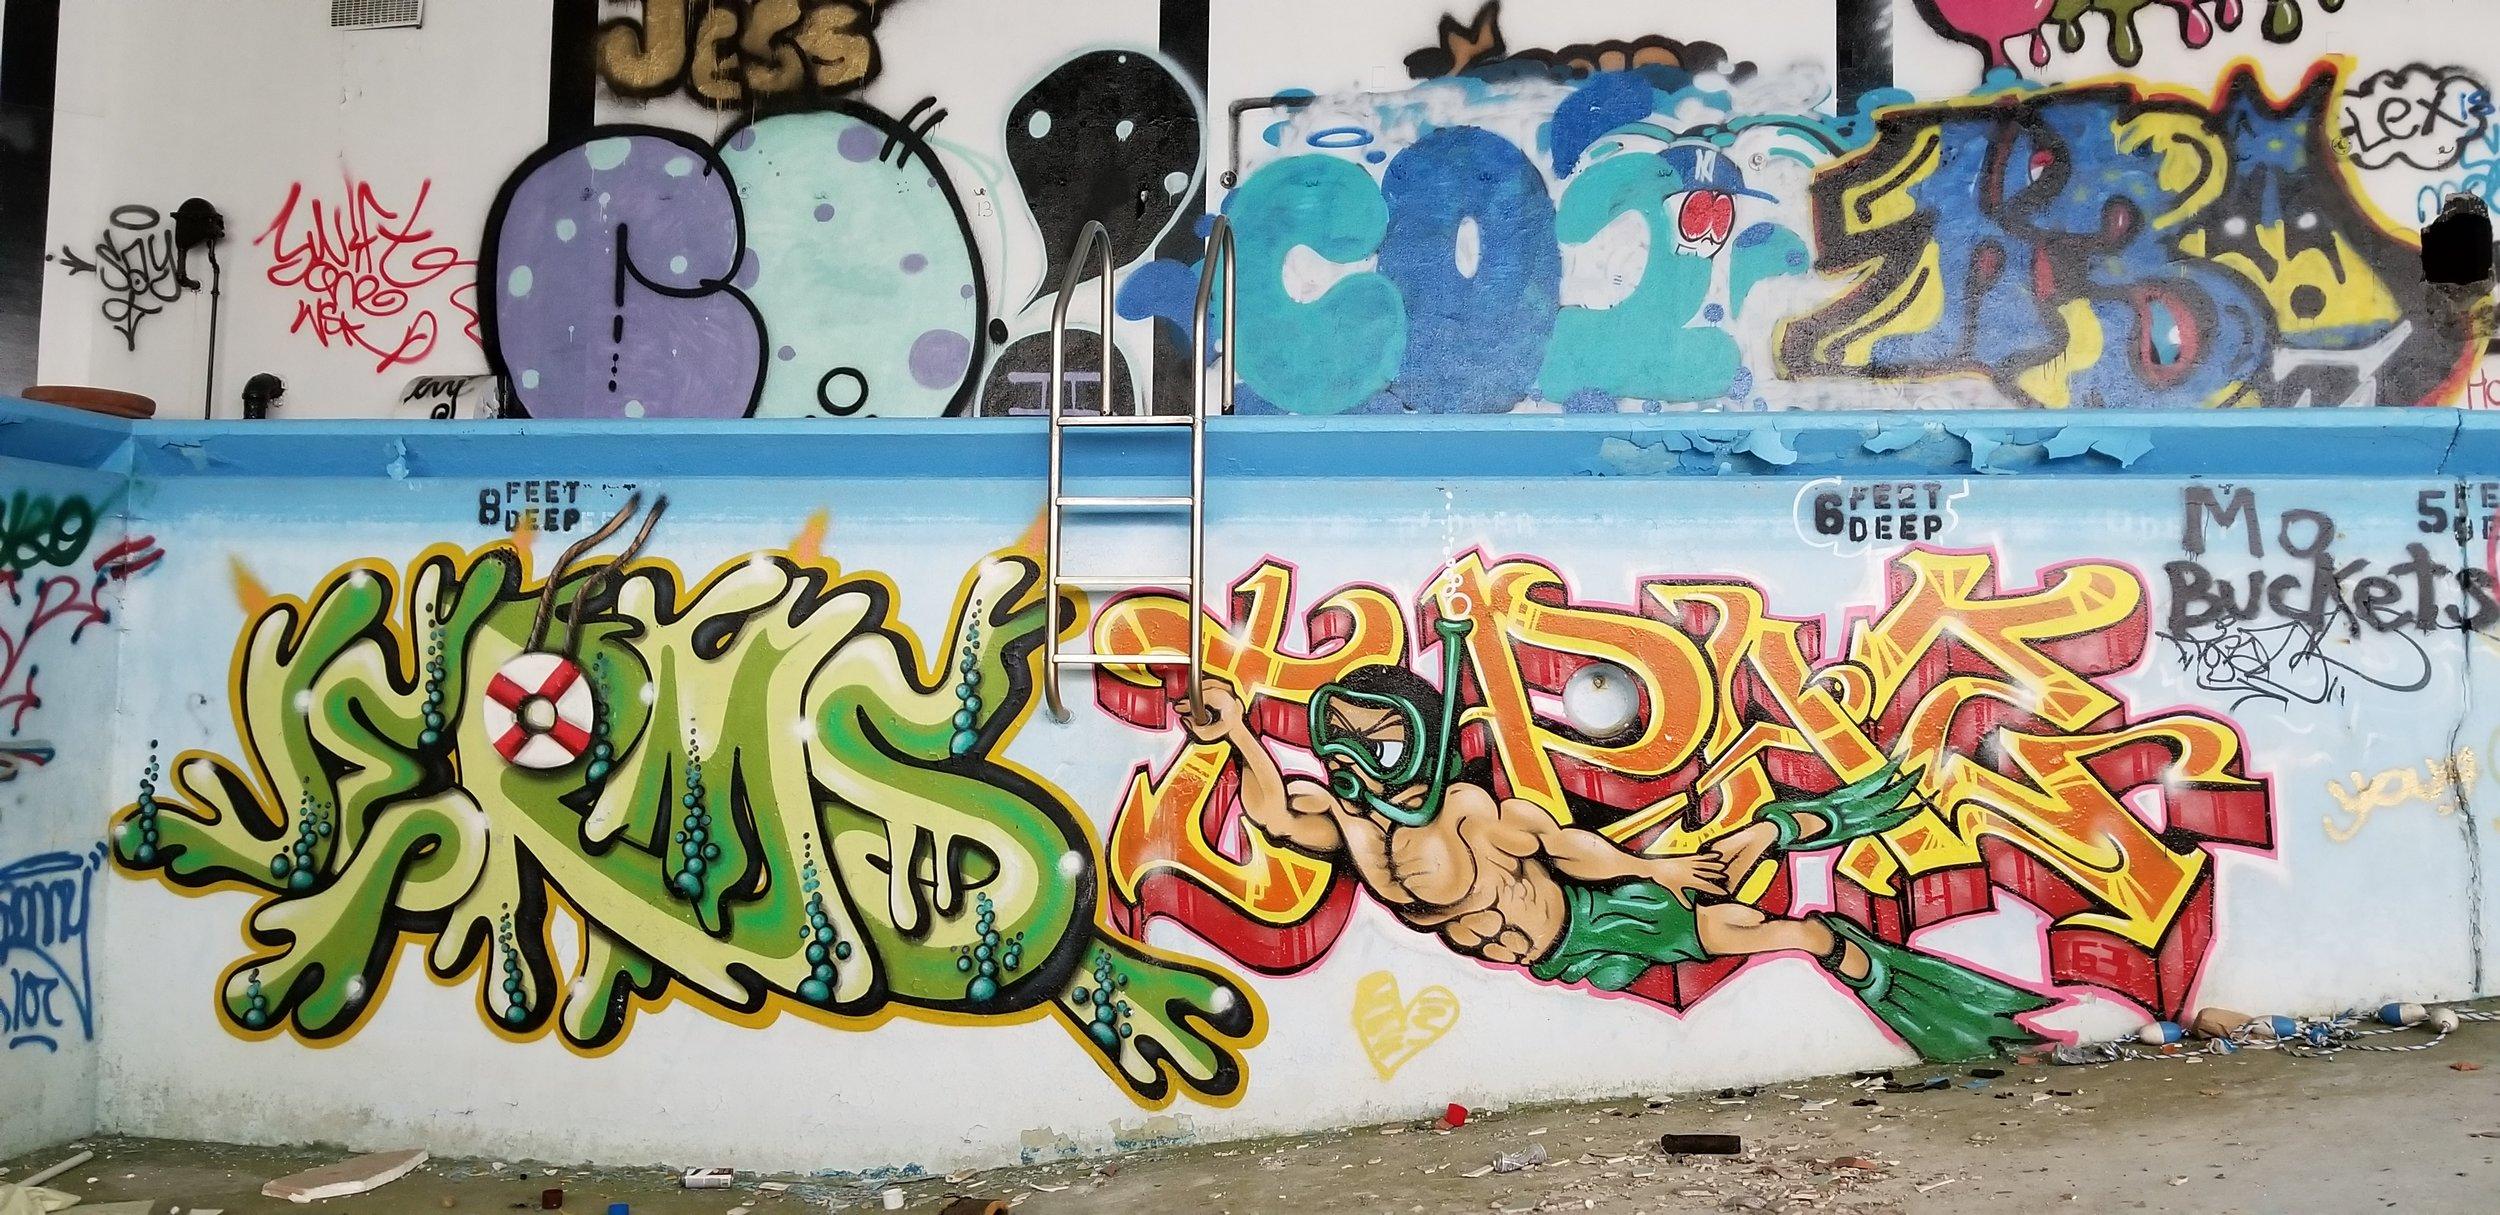 Graffiti in the Homowack lodge pool, taken 2018